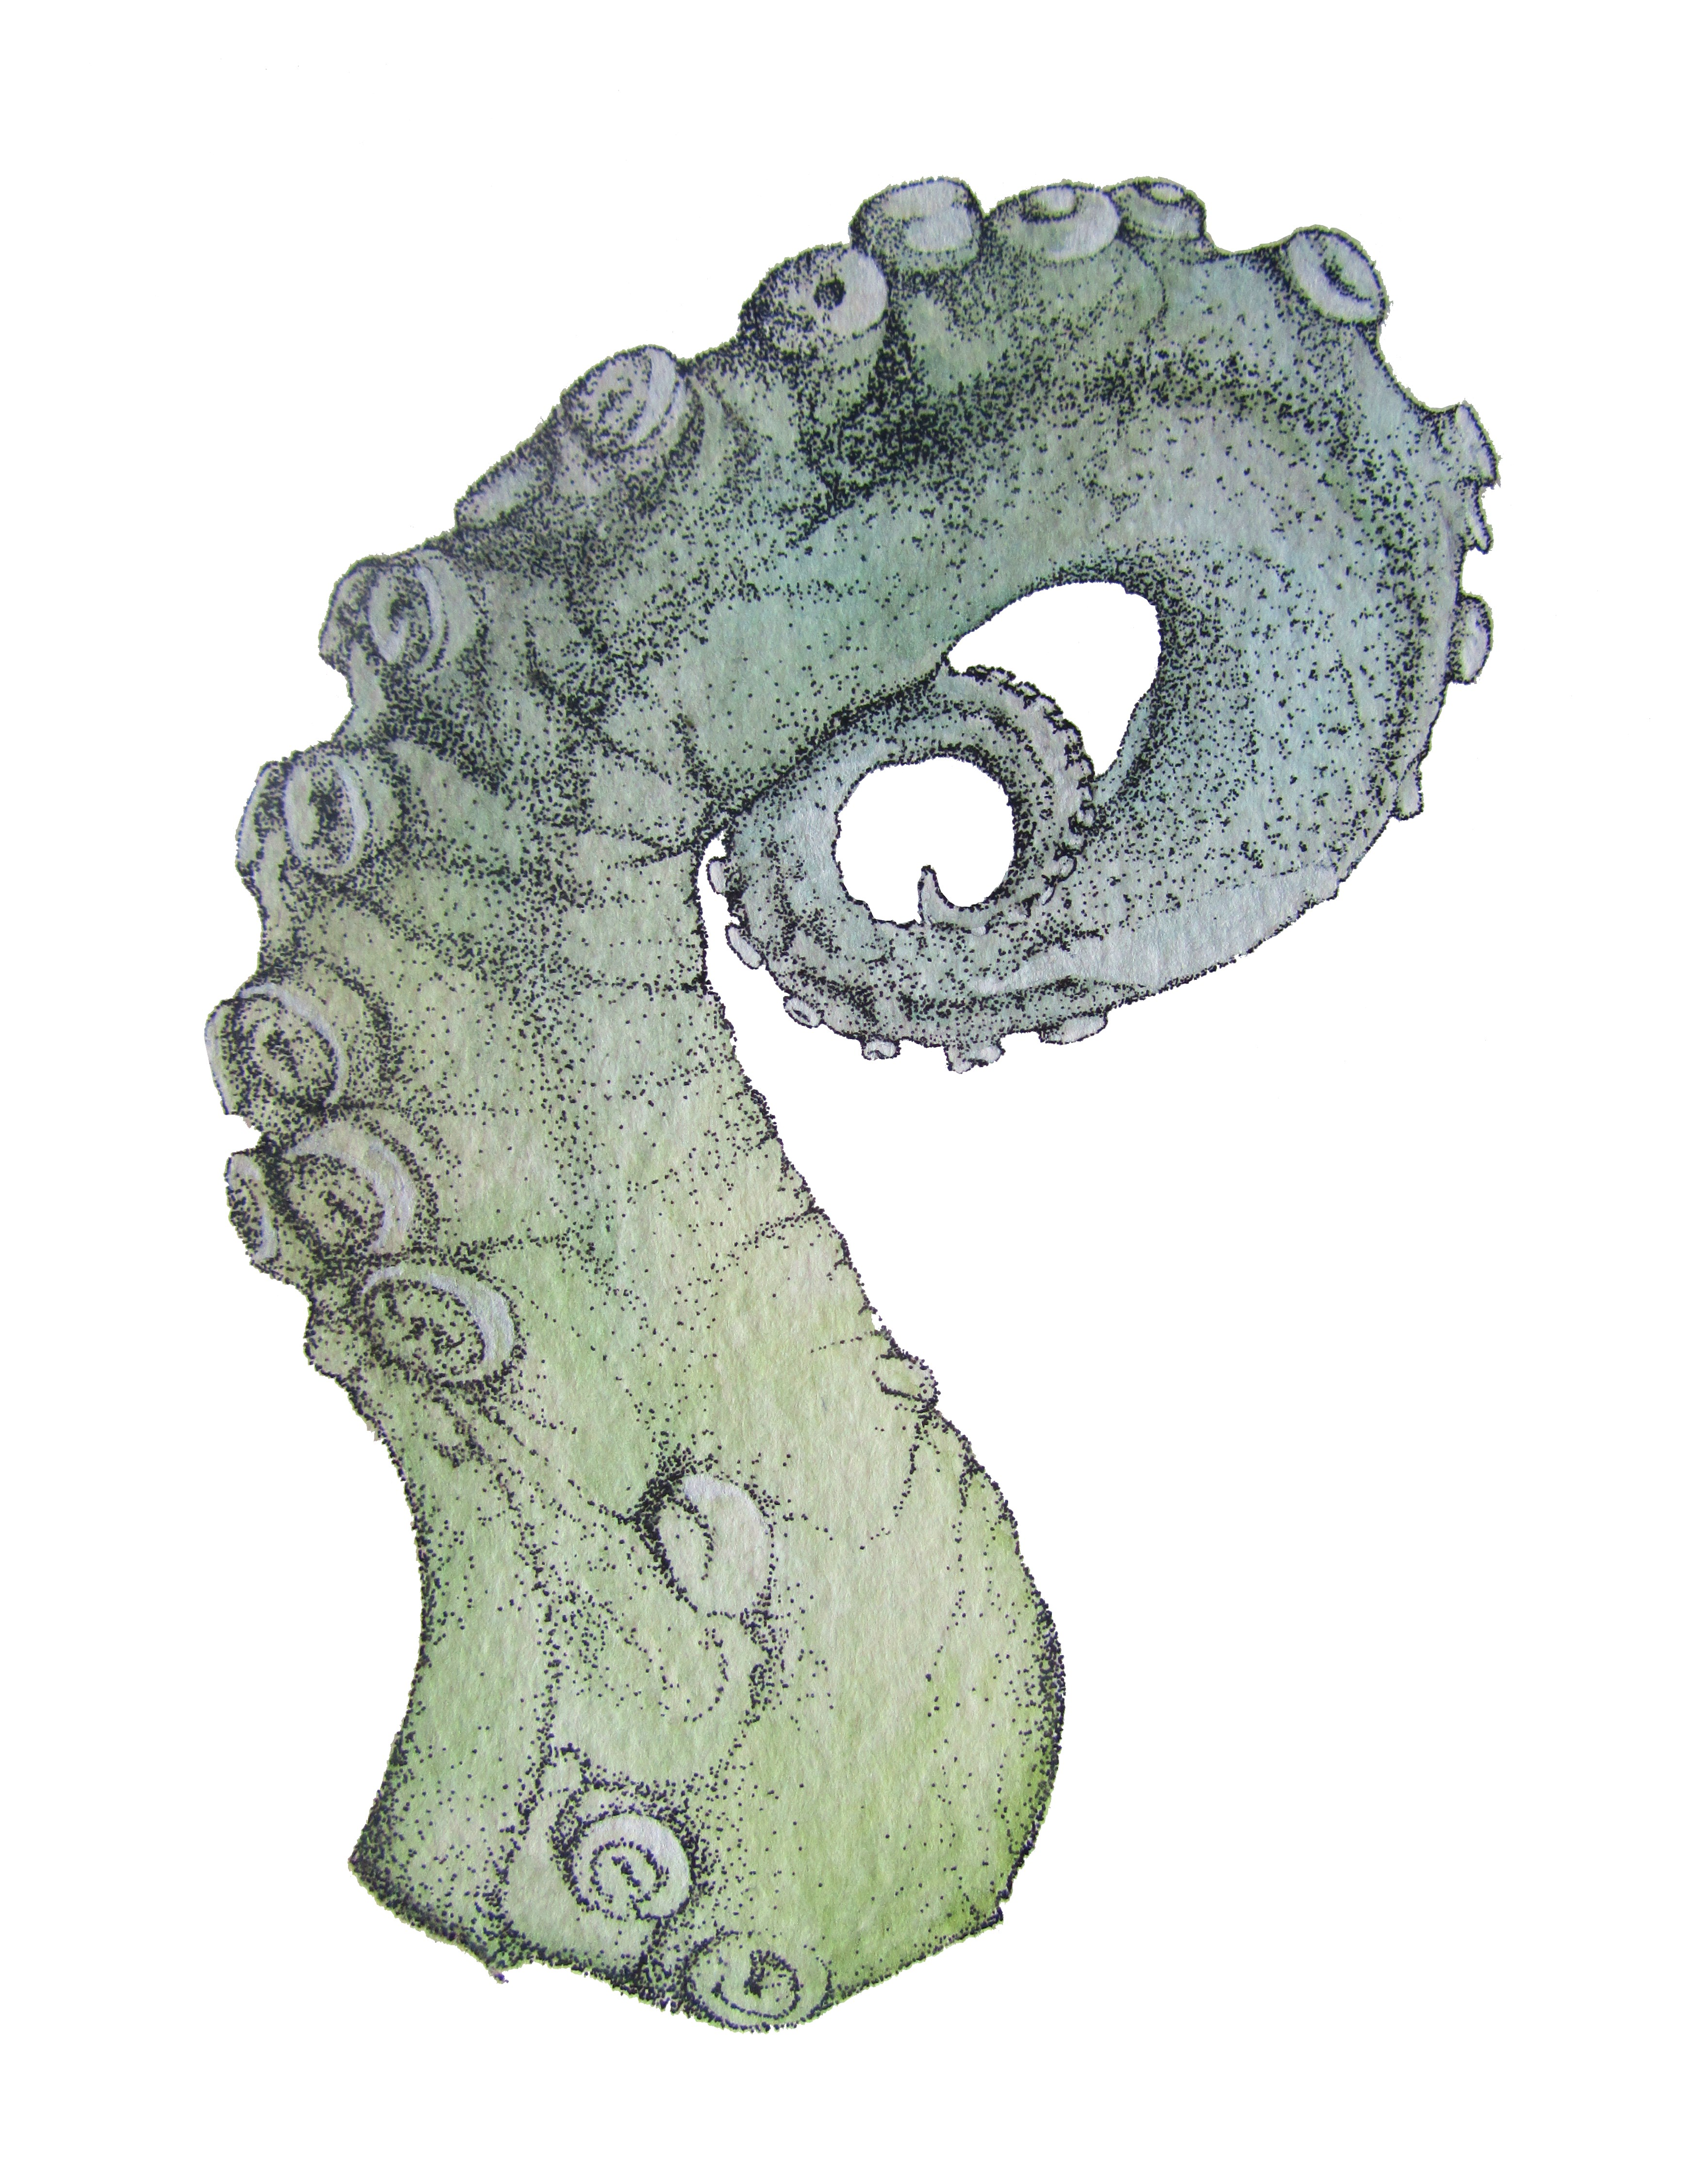 Drawn tentacle I / octopus kraken scientific